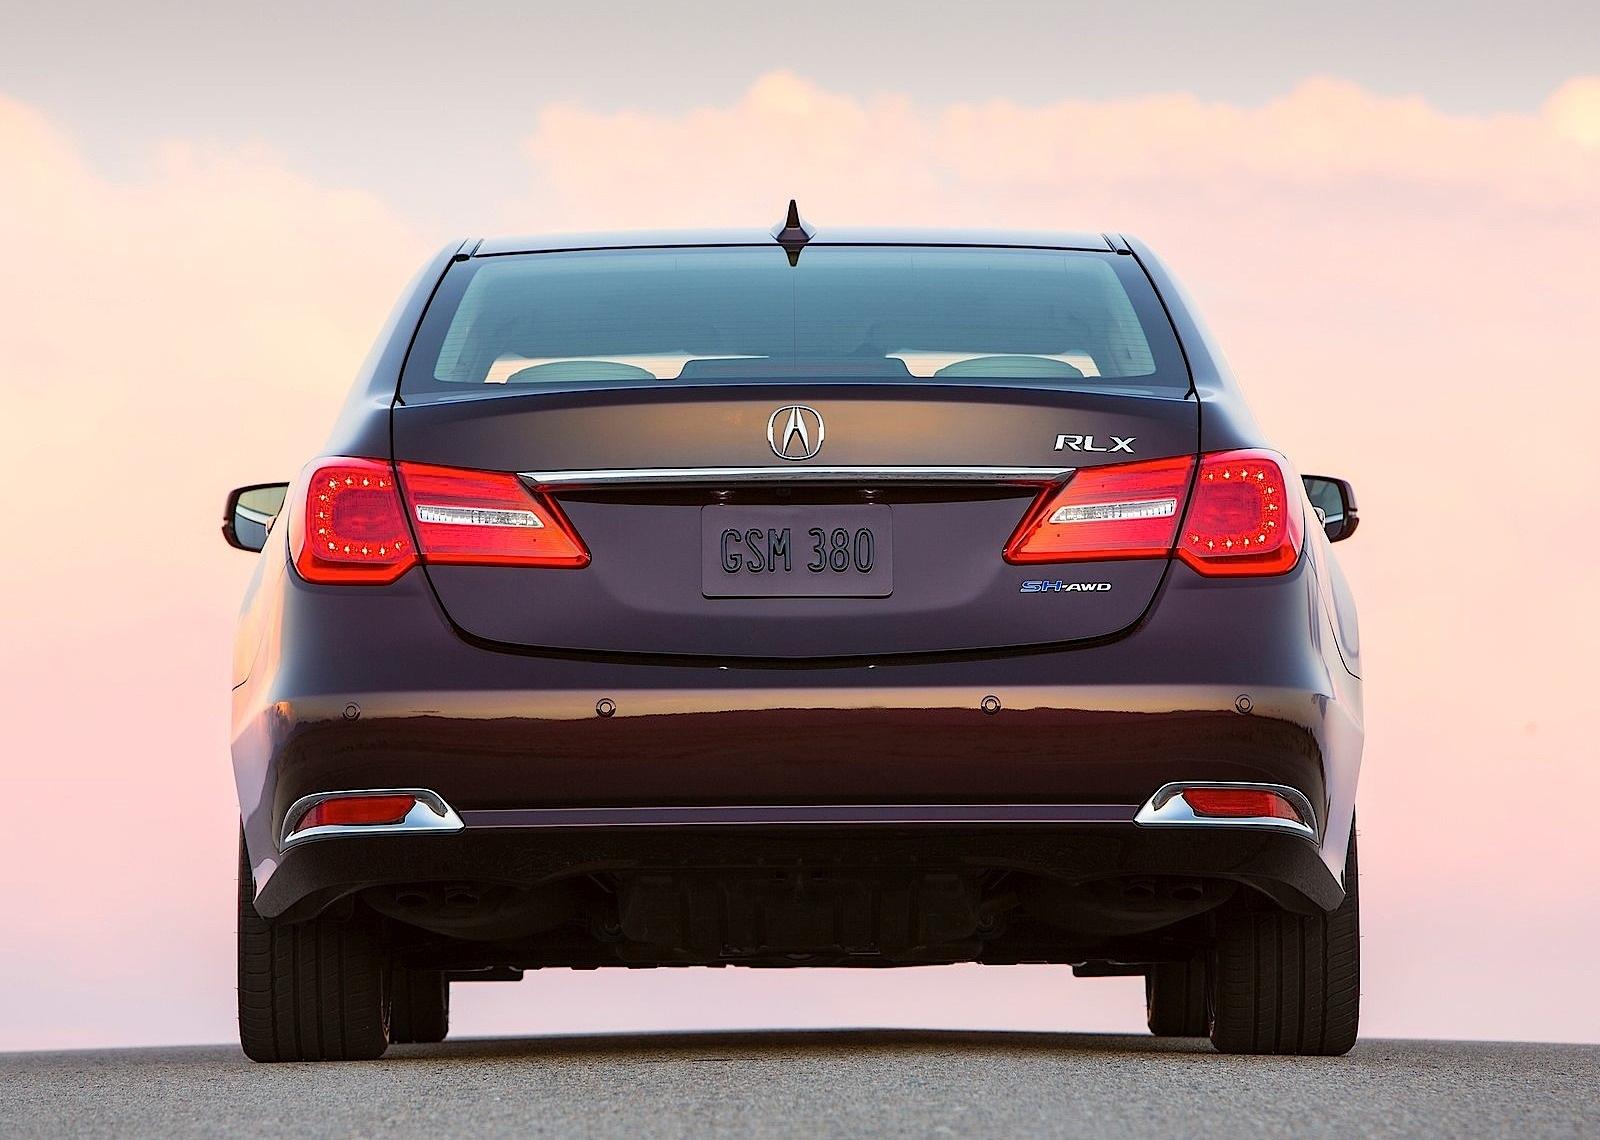 Acura Rlx Specs Amp Photos 2013 2014 2015 2016 2017